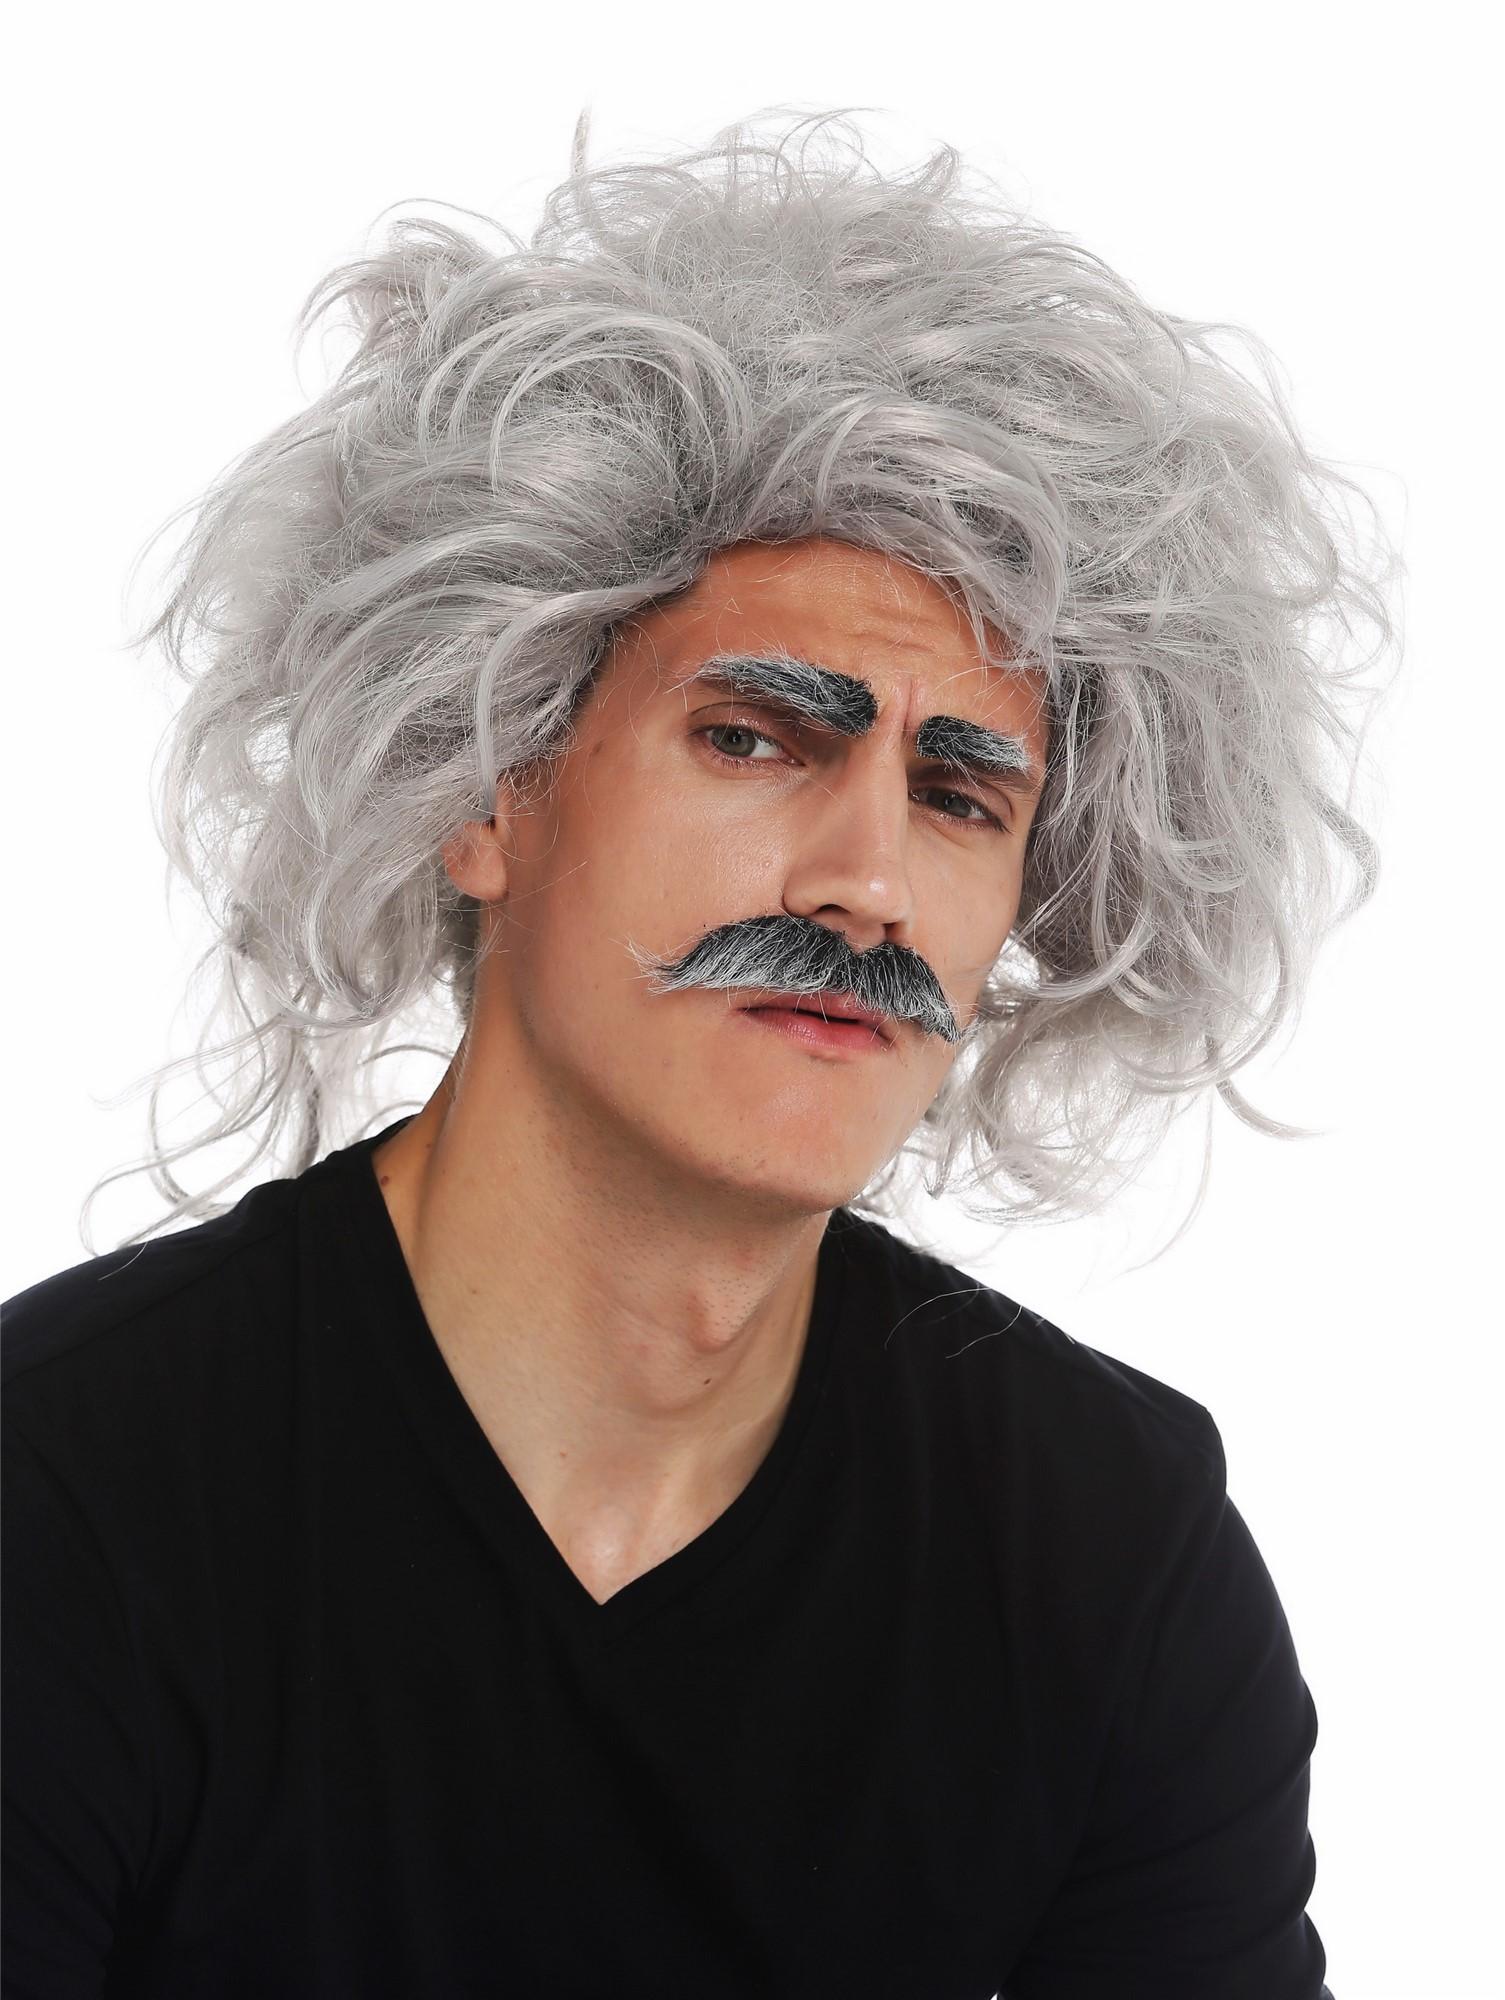 Professor Schnauzbart